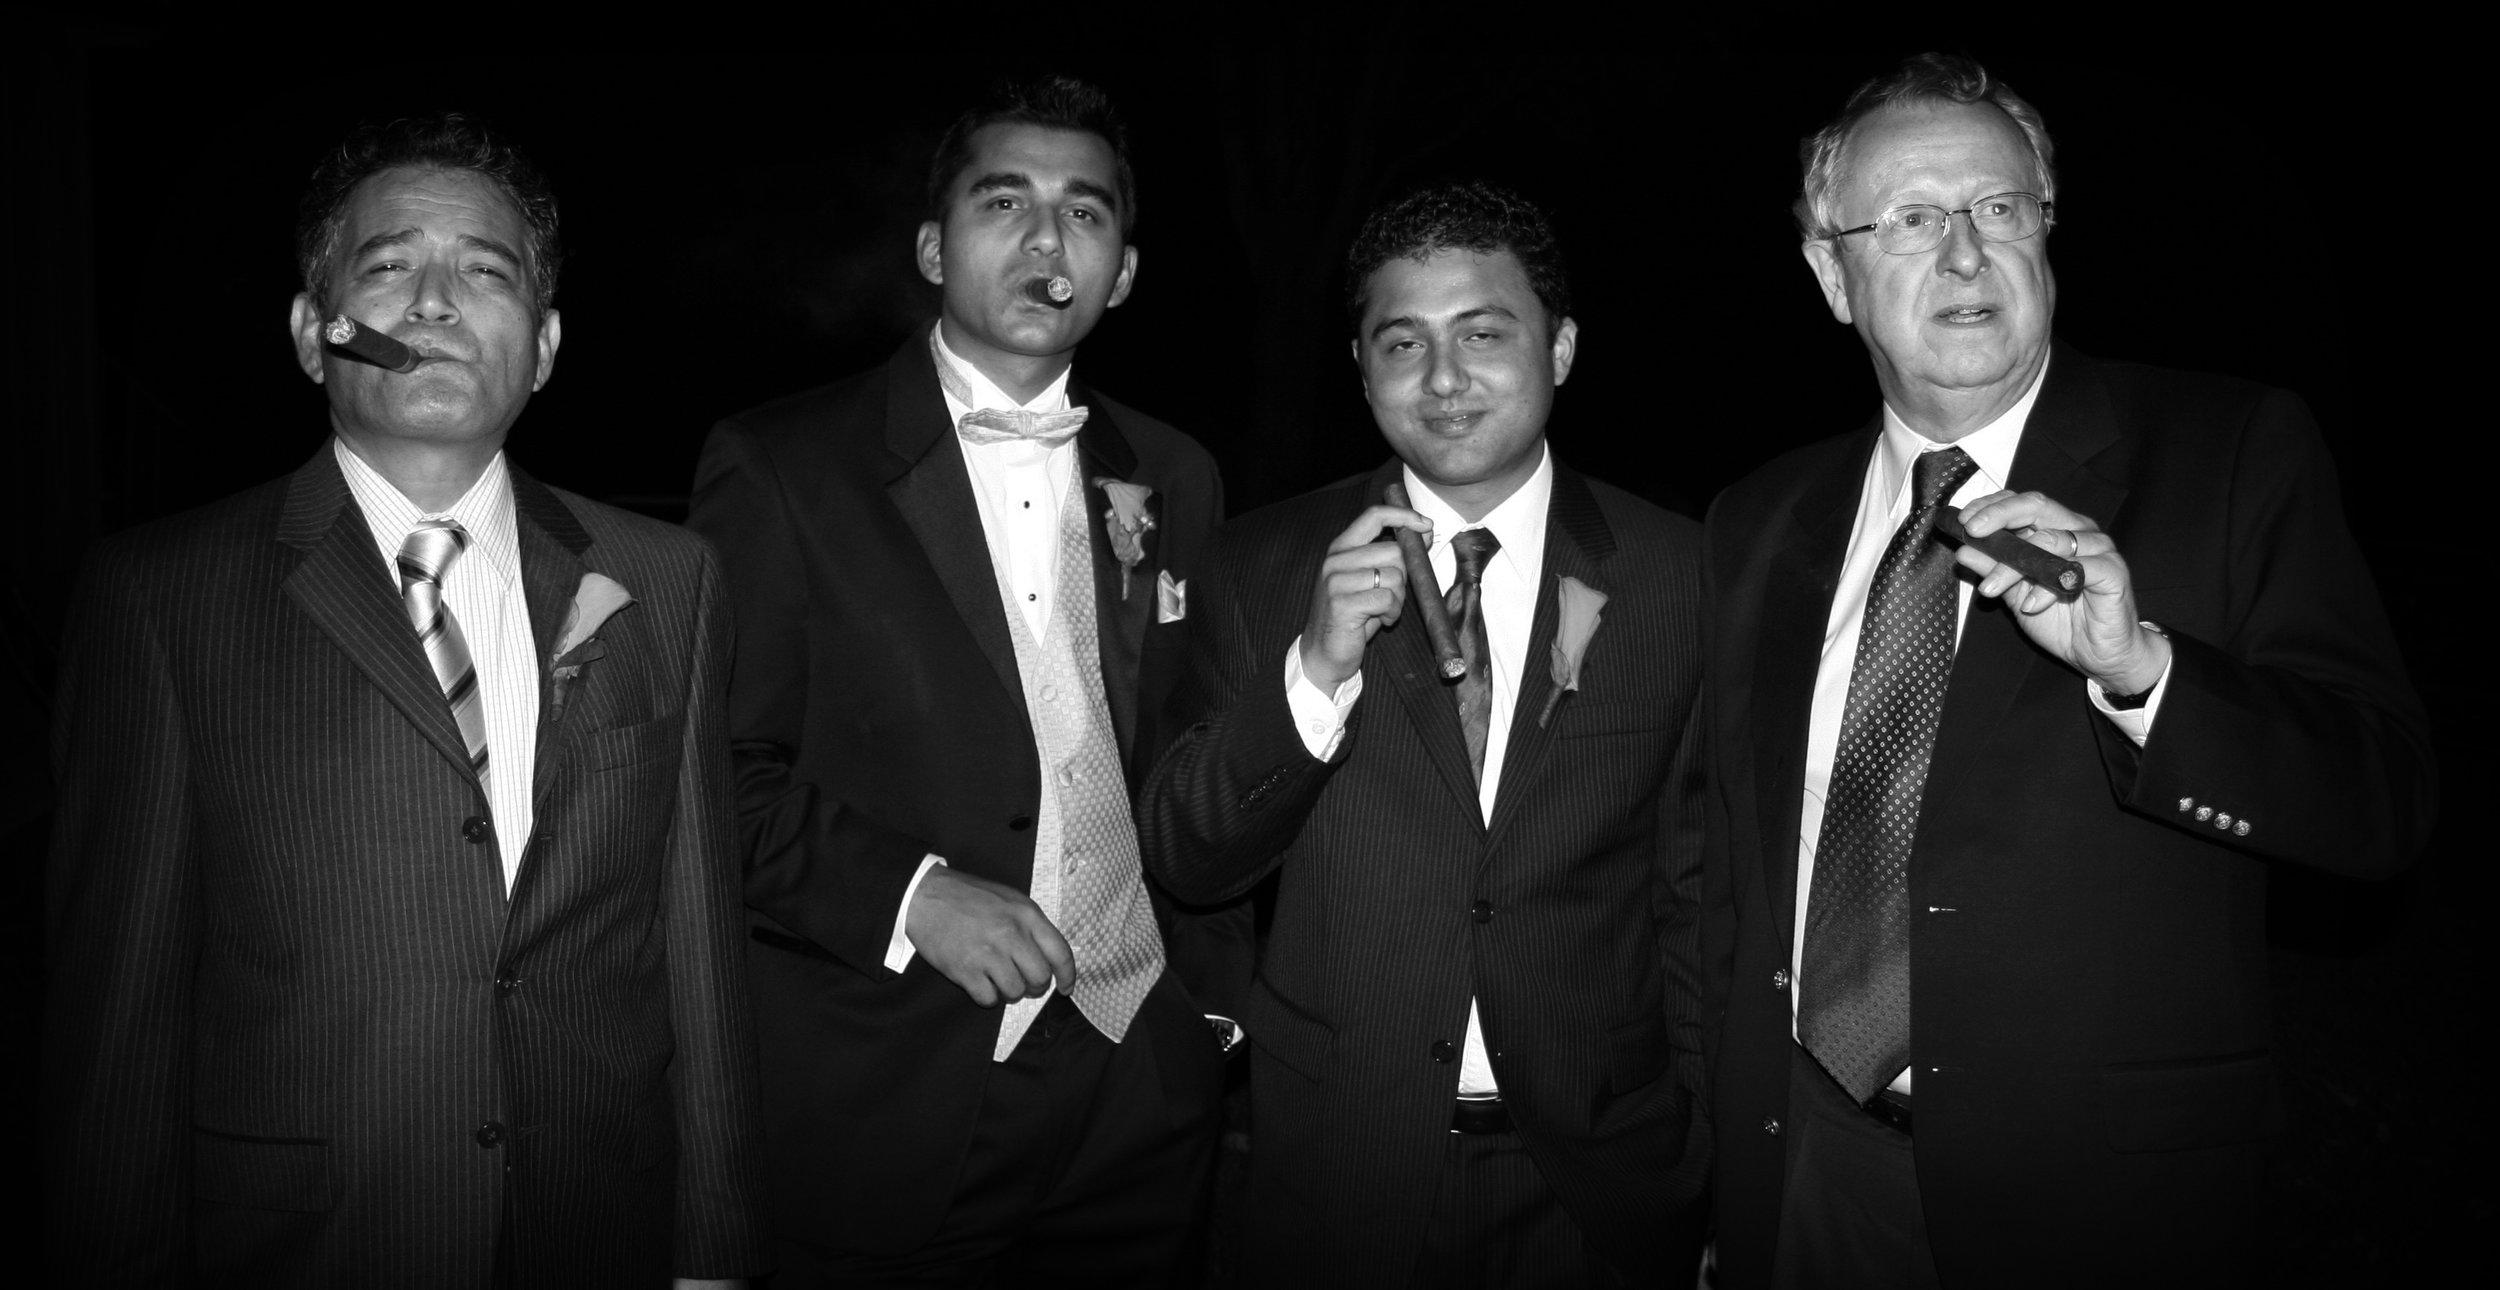 cigars G Pokharel brothers.jpg